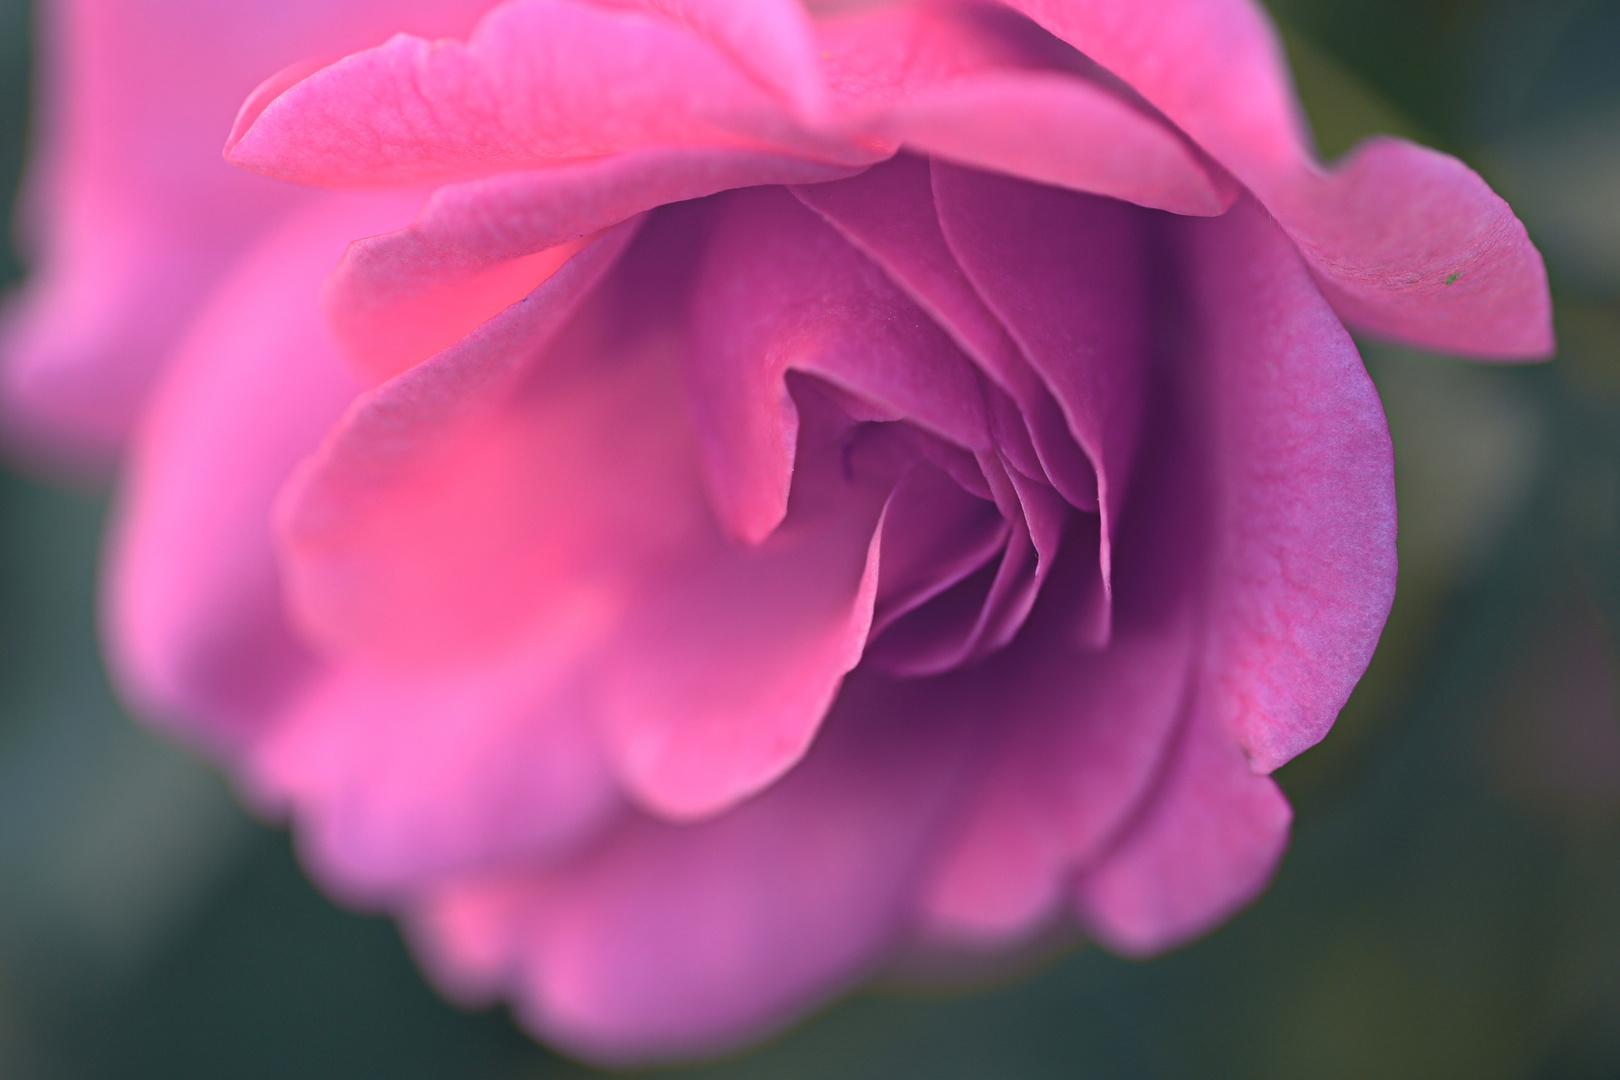 Where the wild roses grow